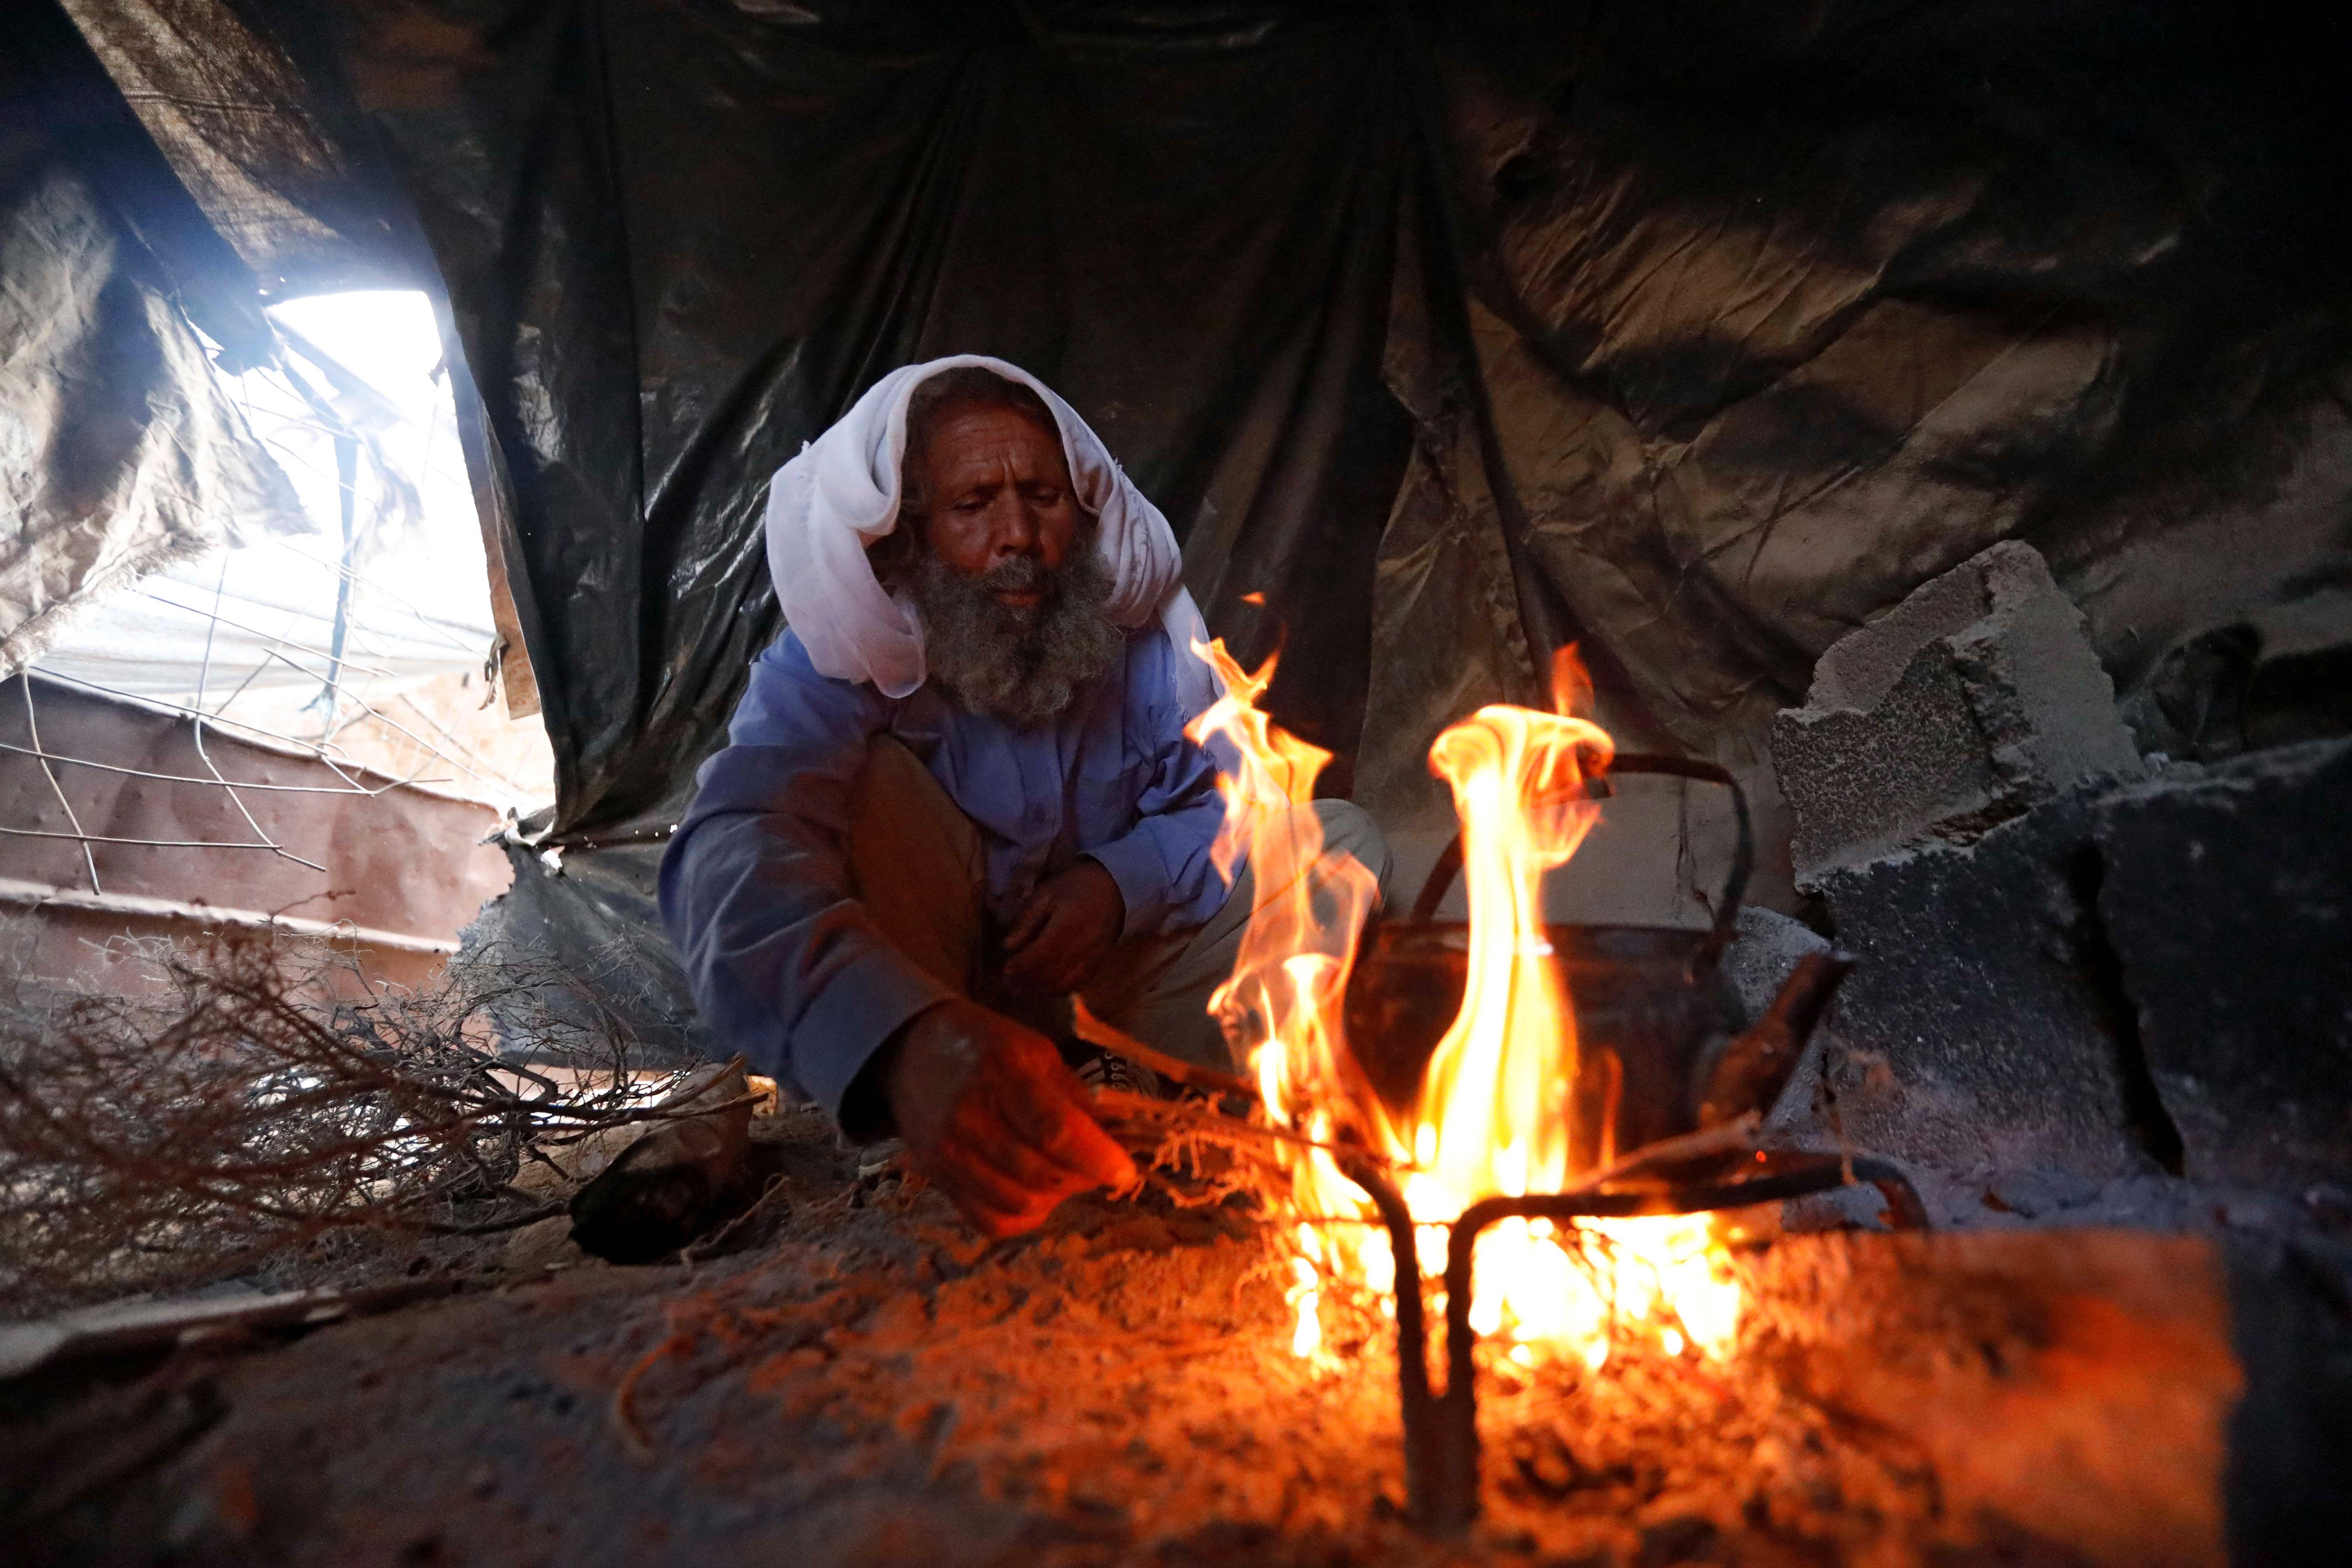 Un home palestí prepara una beguda calenta sobre les flames d'una foguera en una cova, que empra de llar, en un poblat prop de la ciutat de Yatta, al sud d'Hebron, Palestina. /ABED AL HASHLAMOUN